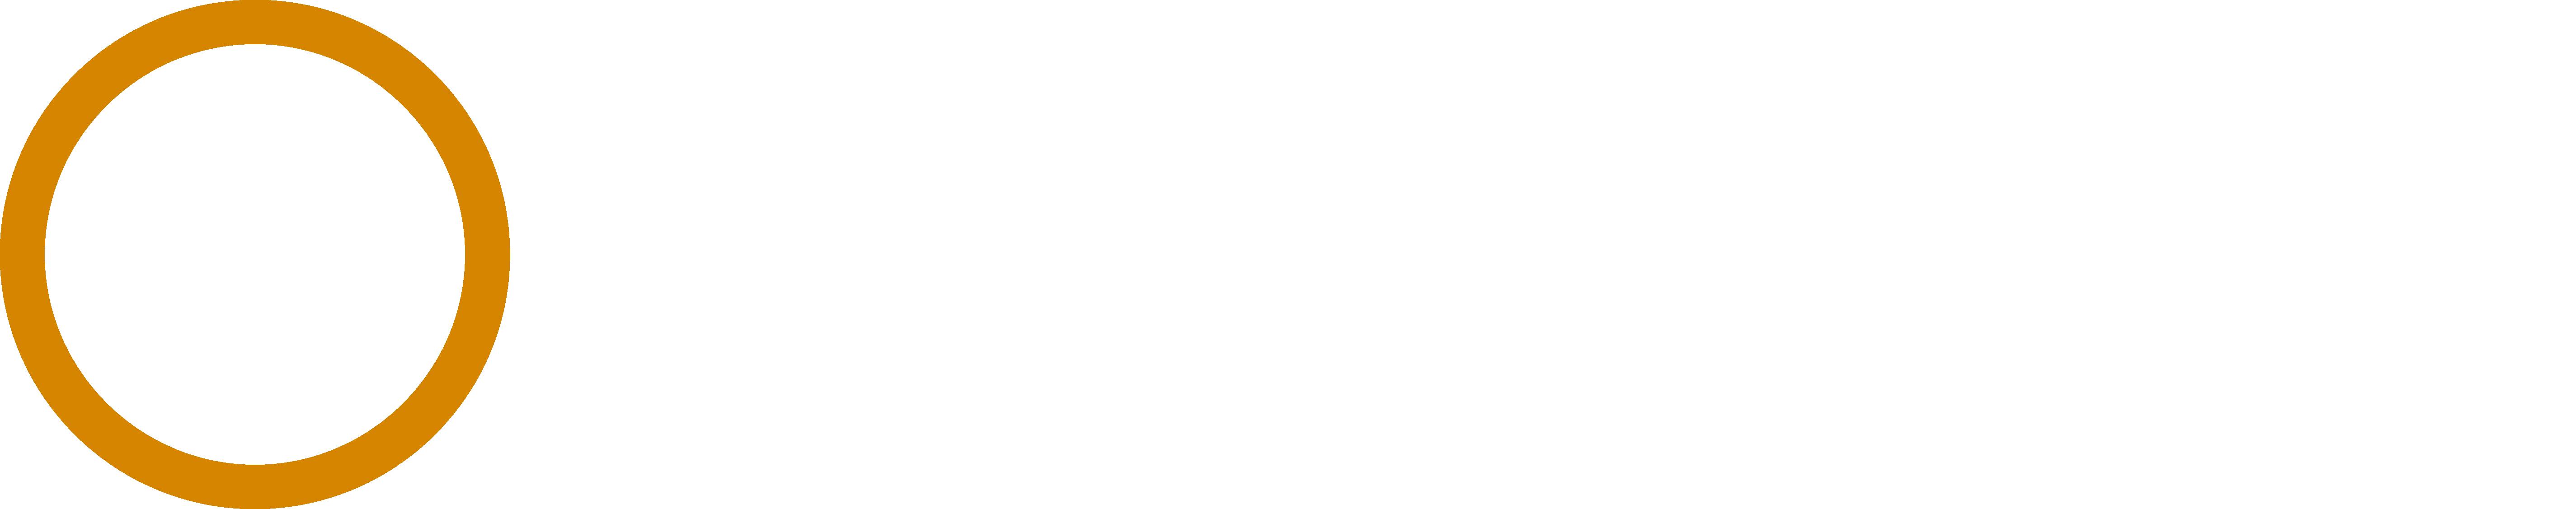 Logotipo Cresol